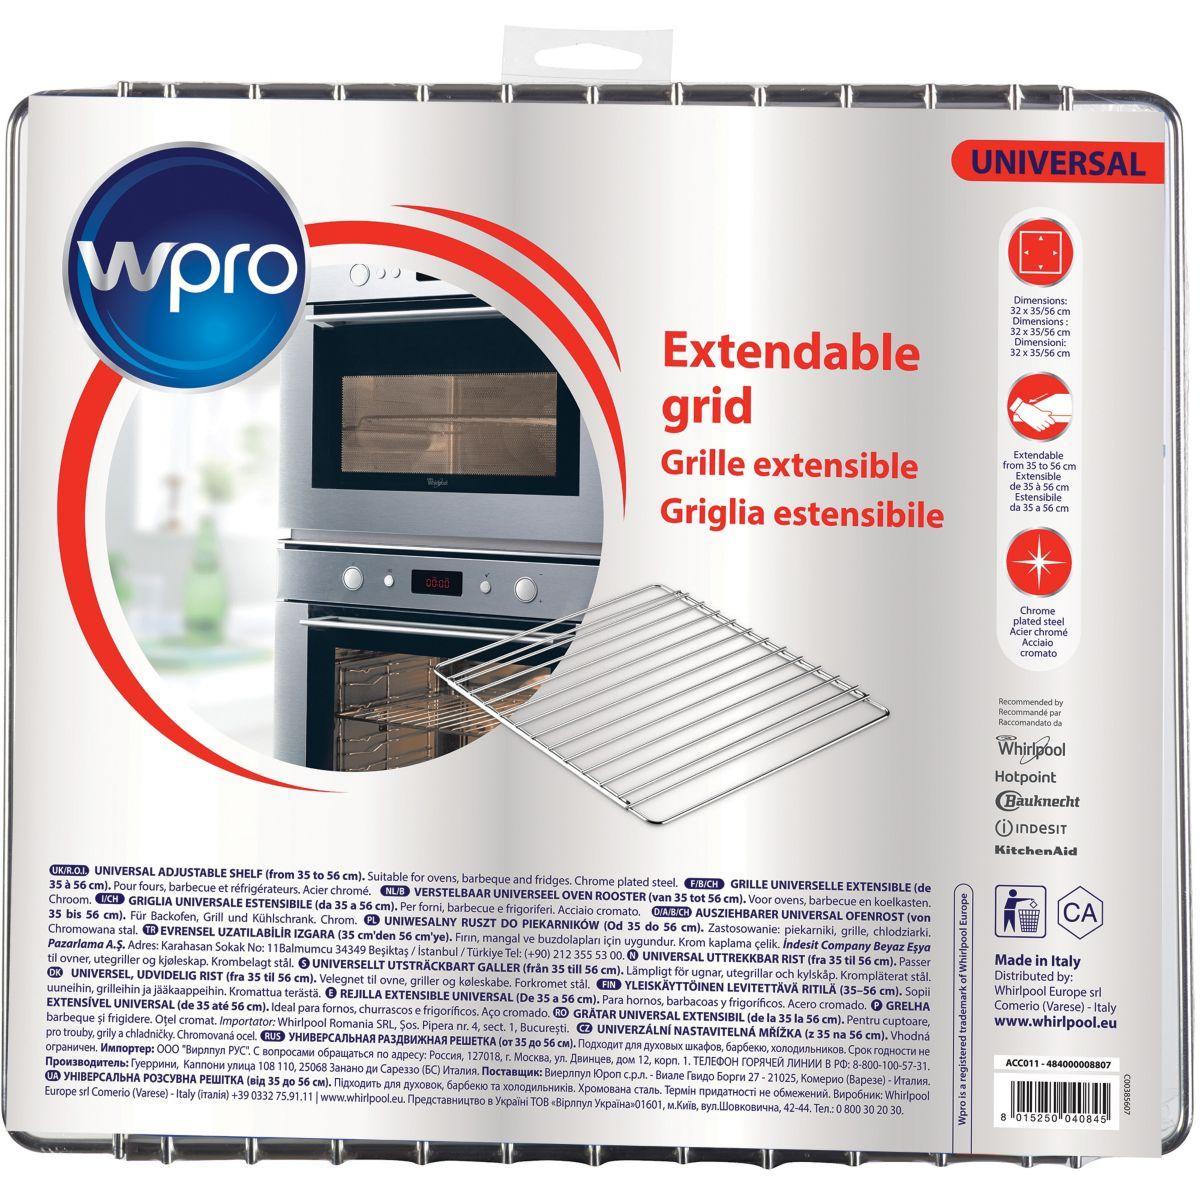 Equipement wpro acc011 grille extensible (photo)